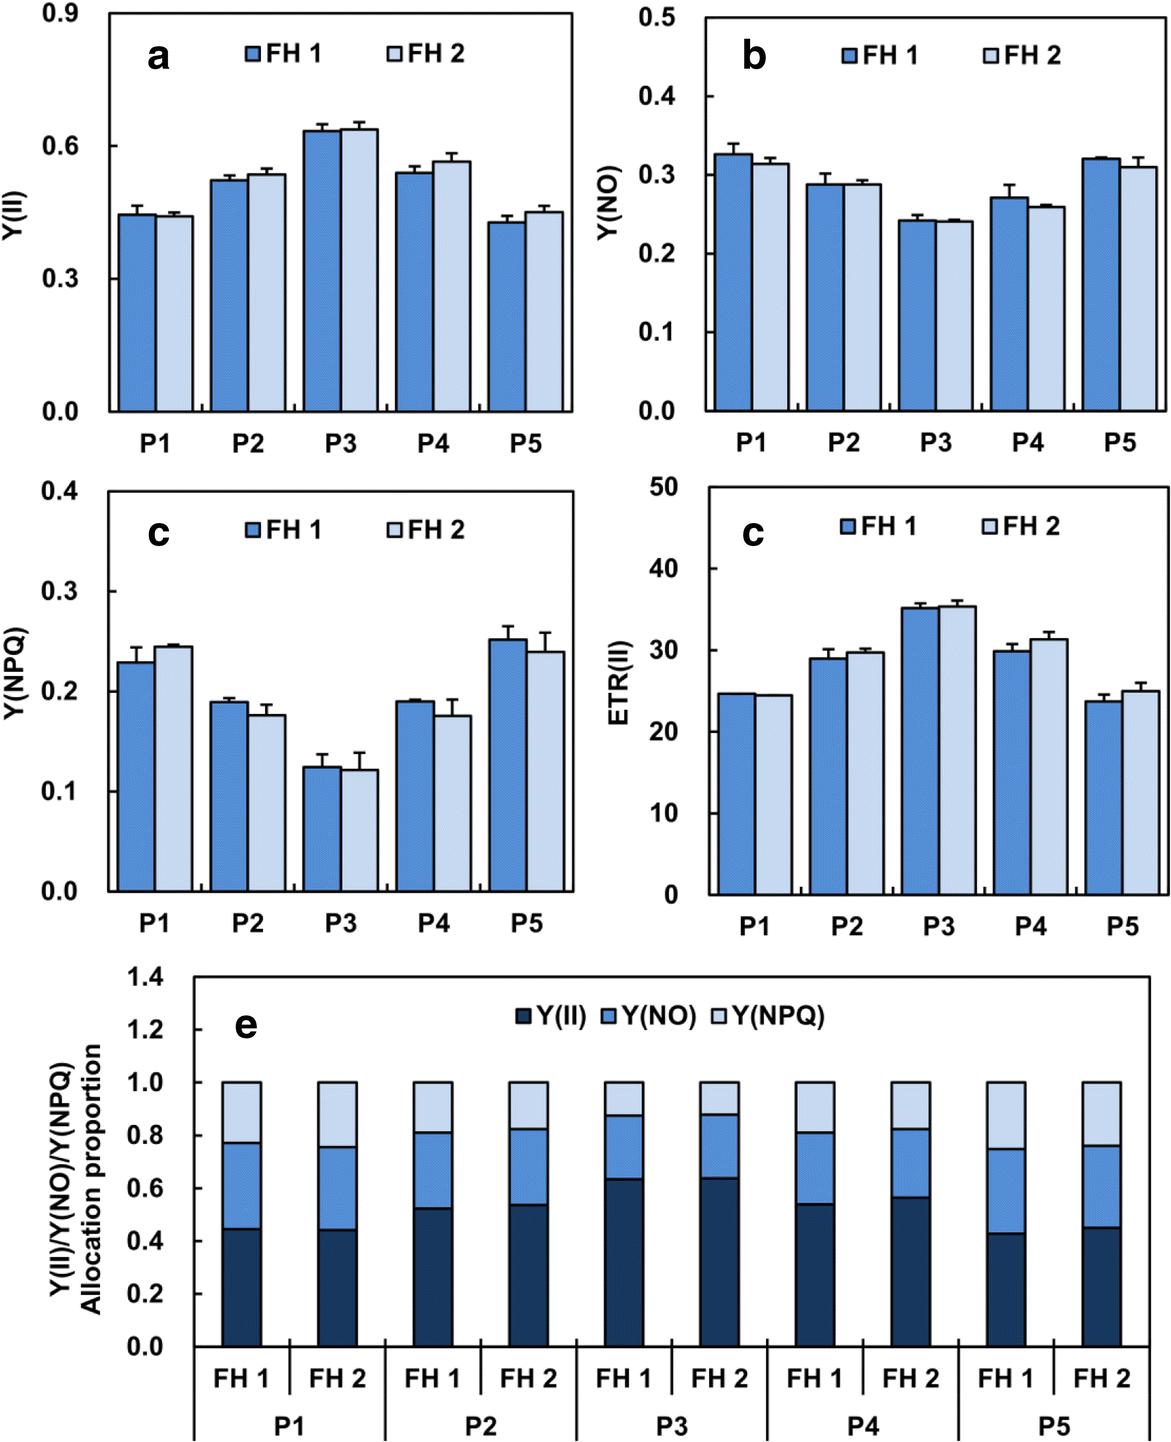 Phosphorus-fertilisation has differential effects on leaf